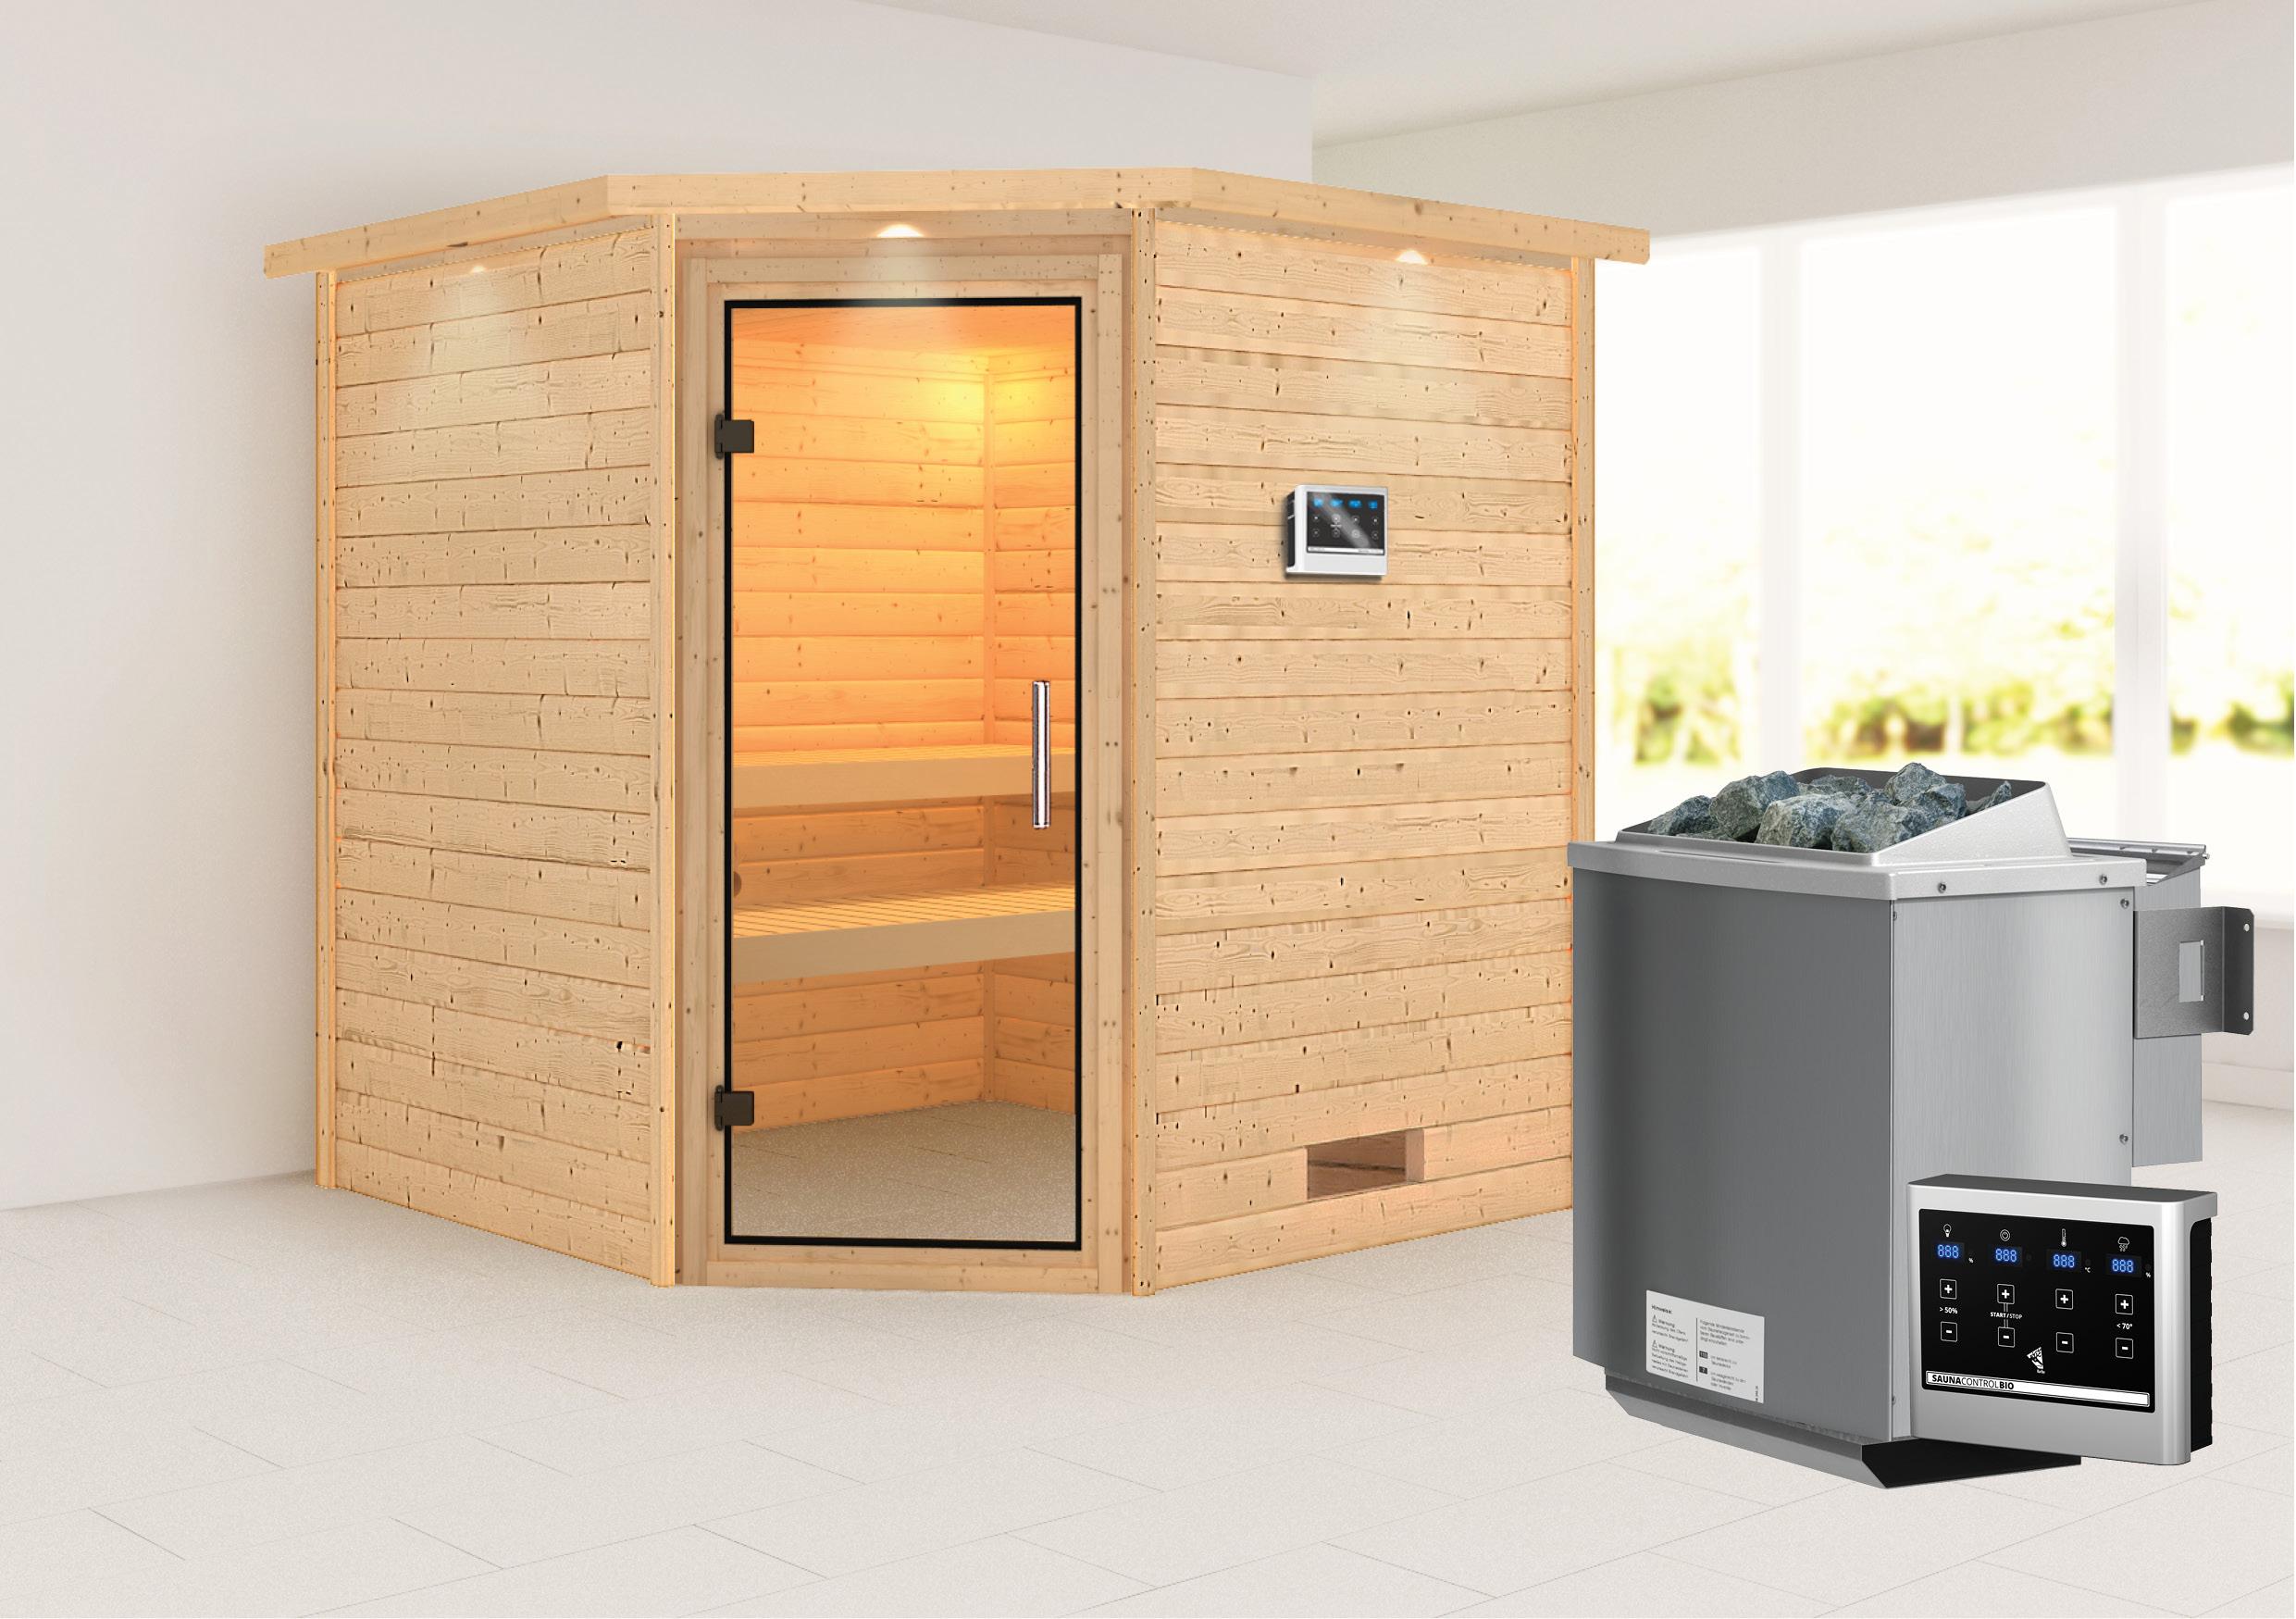 WoodFeeling Sauna Nina 38mm Bio Saunaofen 9kW ext. Kranz Klarglas Tür Bild 1